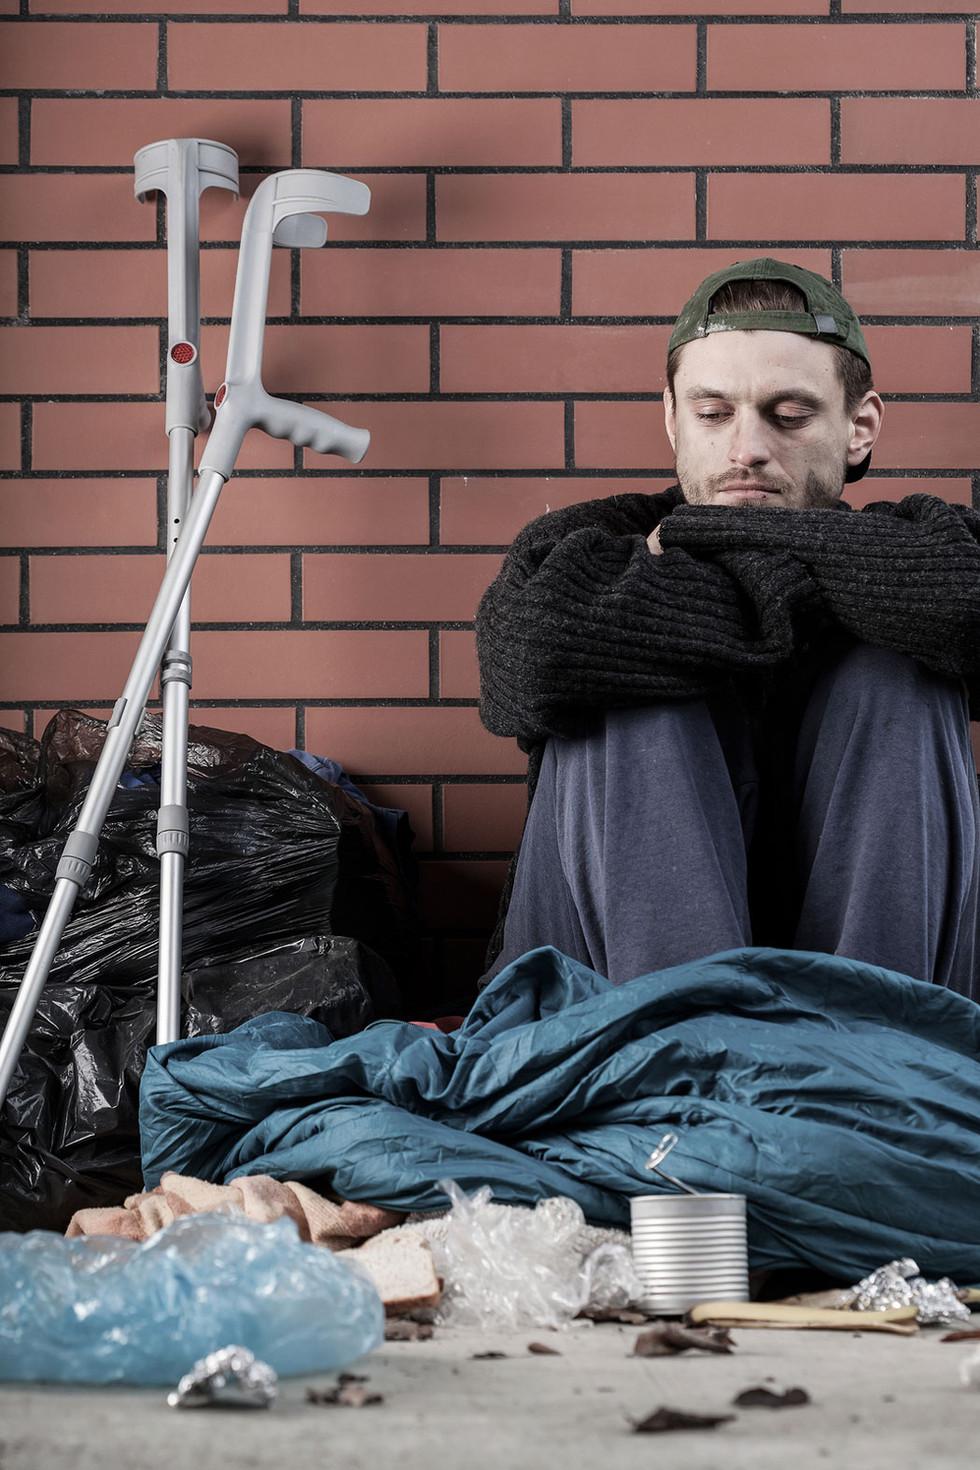 bigstock-Ill-Homeless-Young-Man-74586535